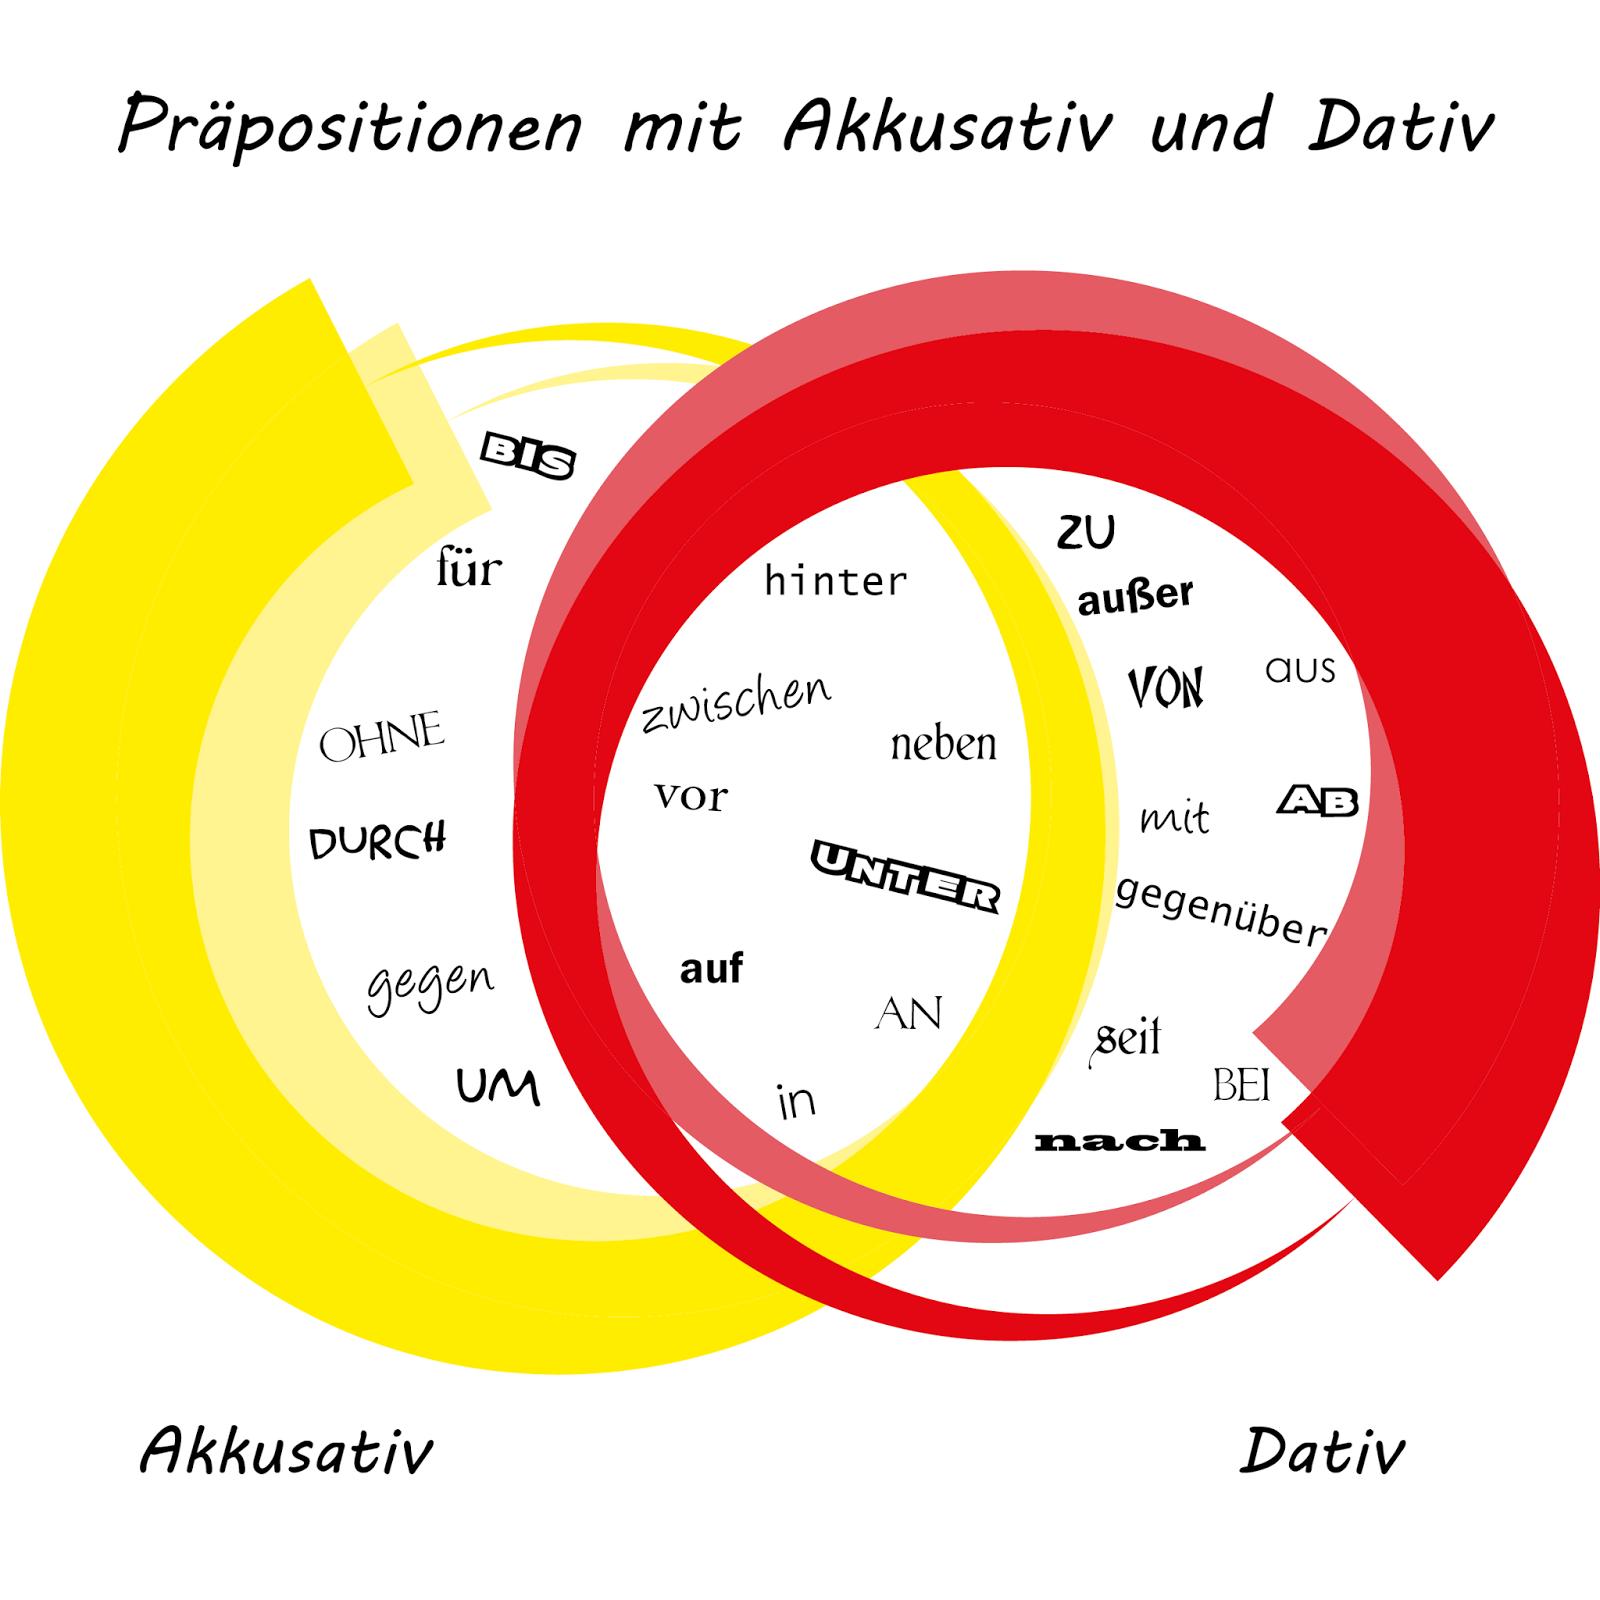 soloaleman.blogspot.com  - Präpositionen mit Akkusativ und Dativ